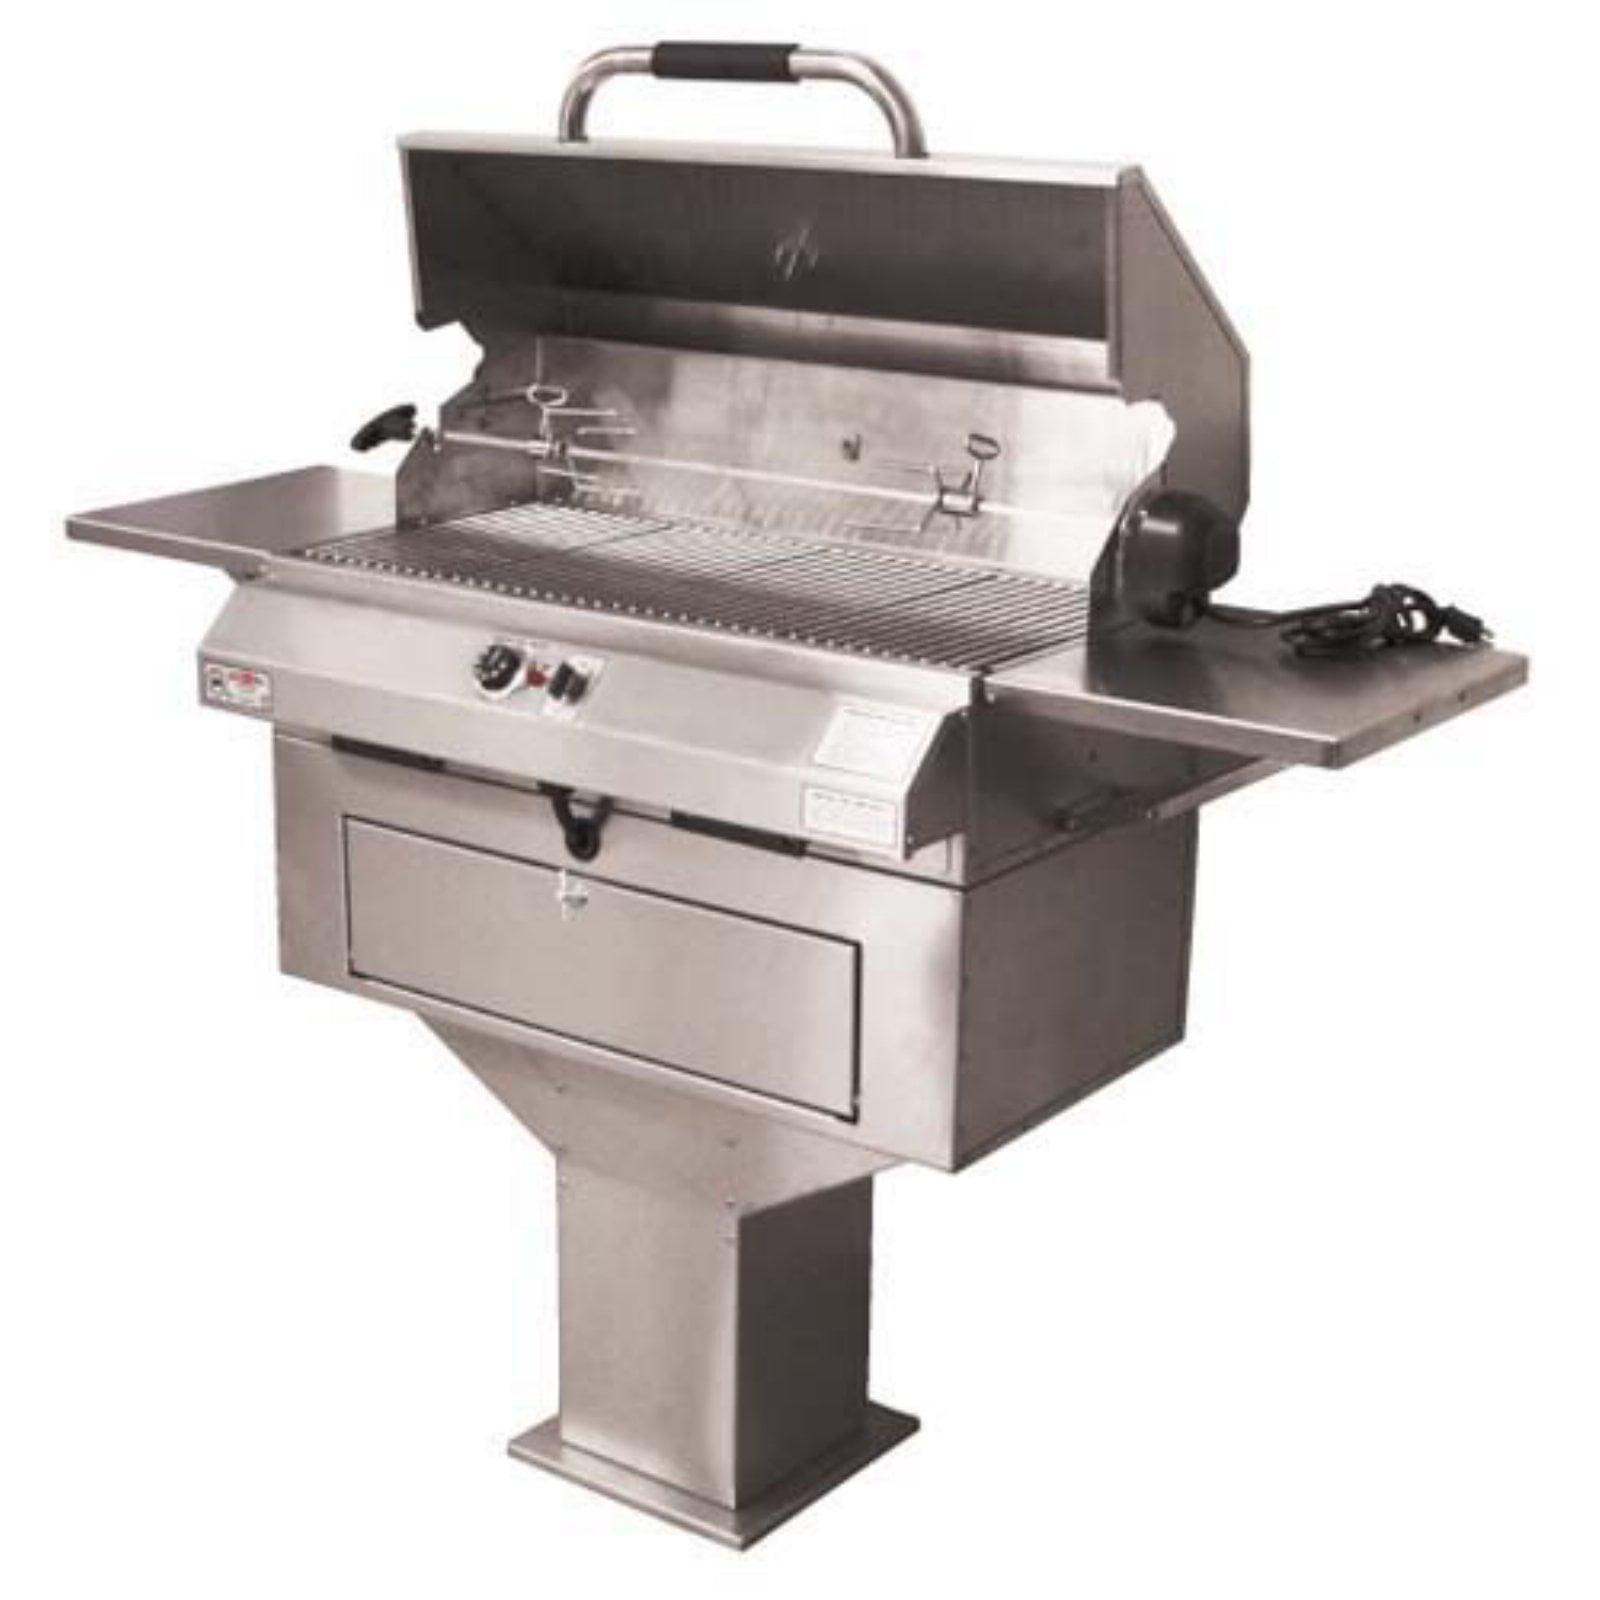 Electri-Chef Electric Grill Single Burner by Electri - Chef Grill